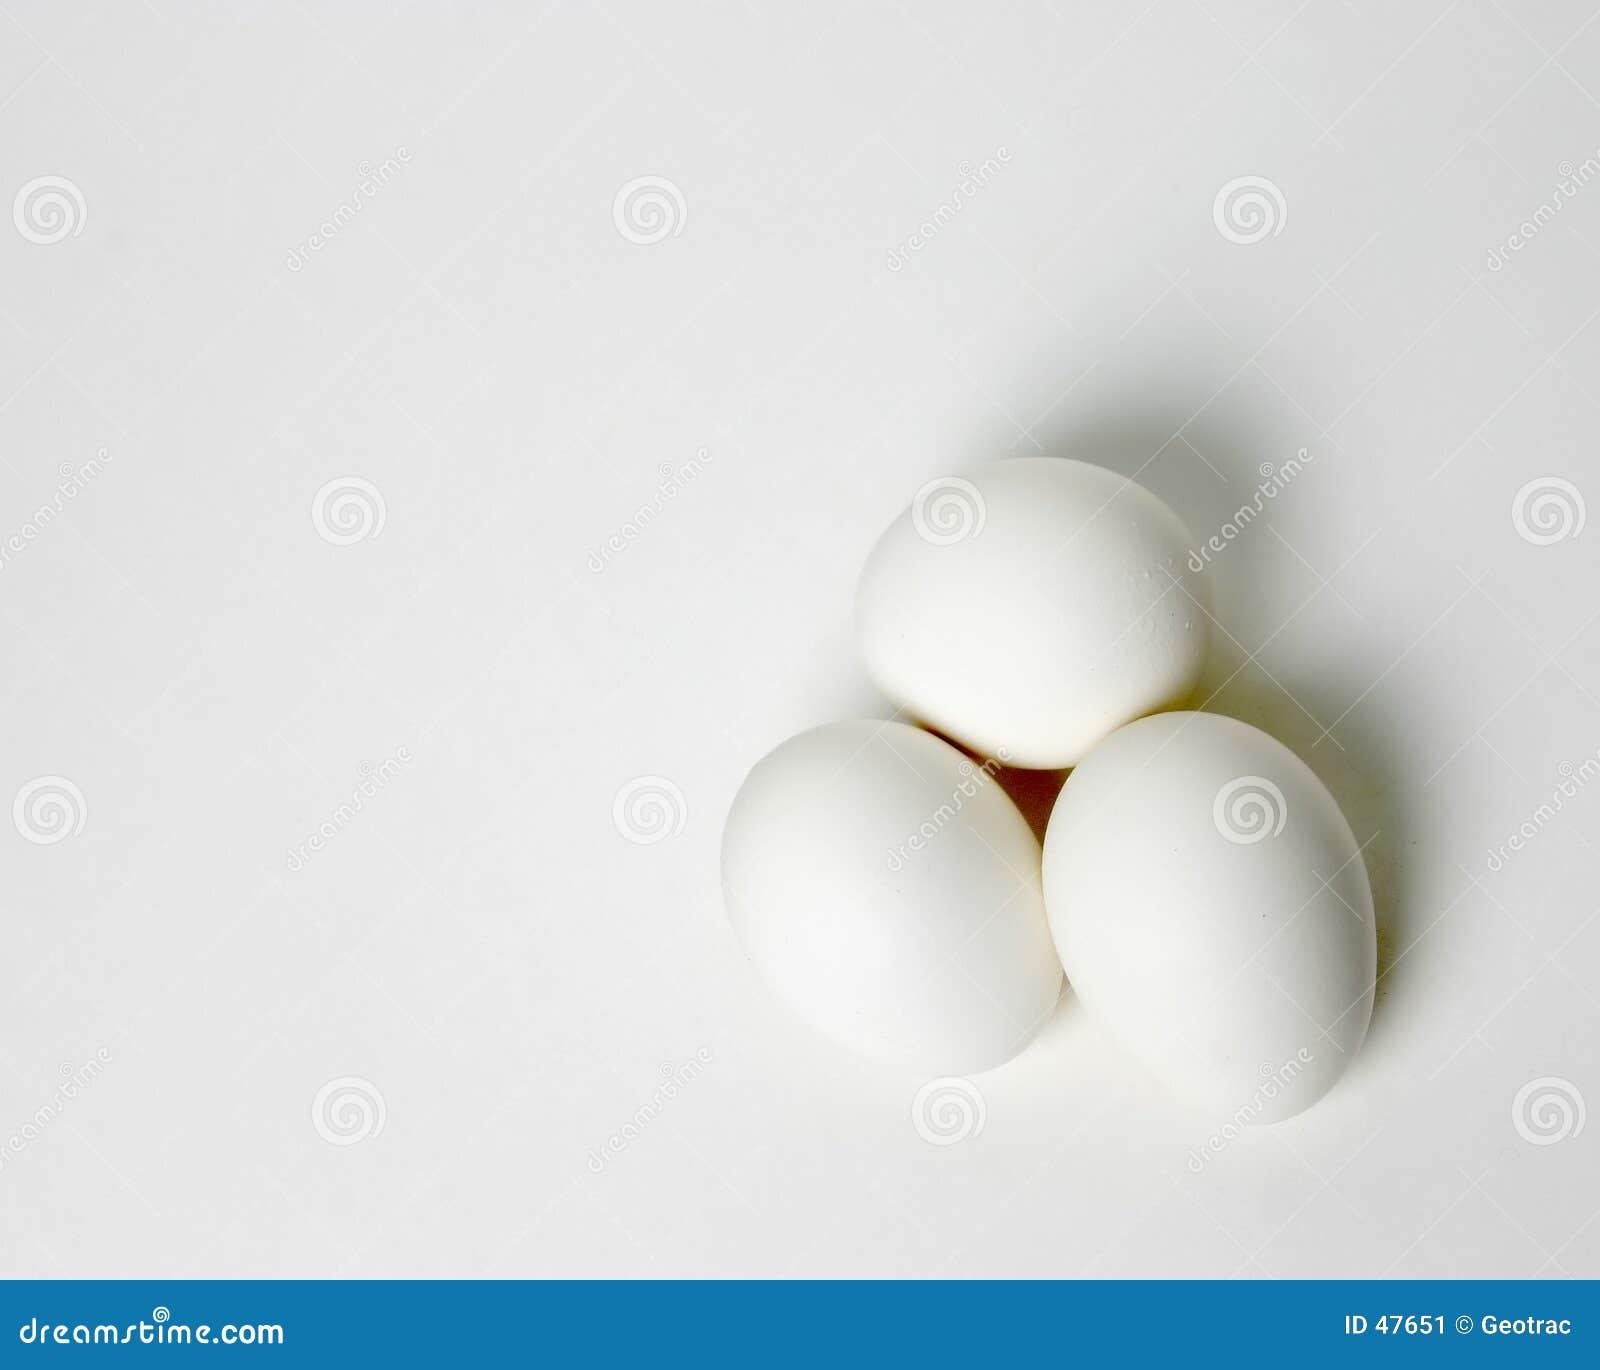 Jajko tercetu white